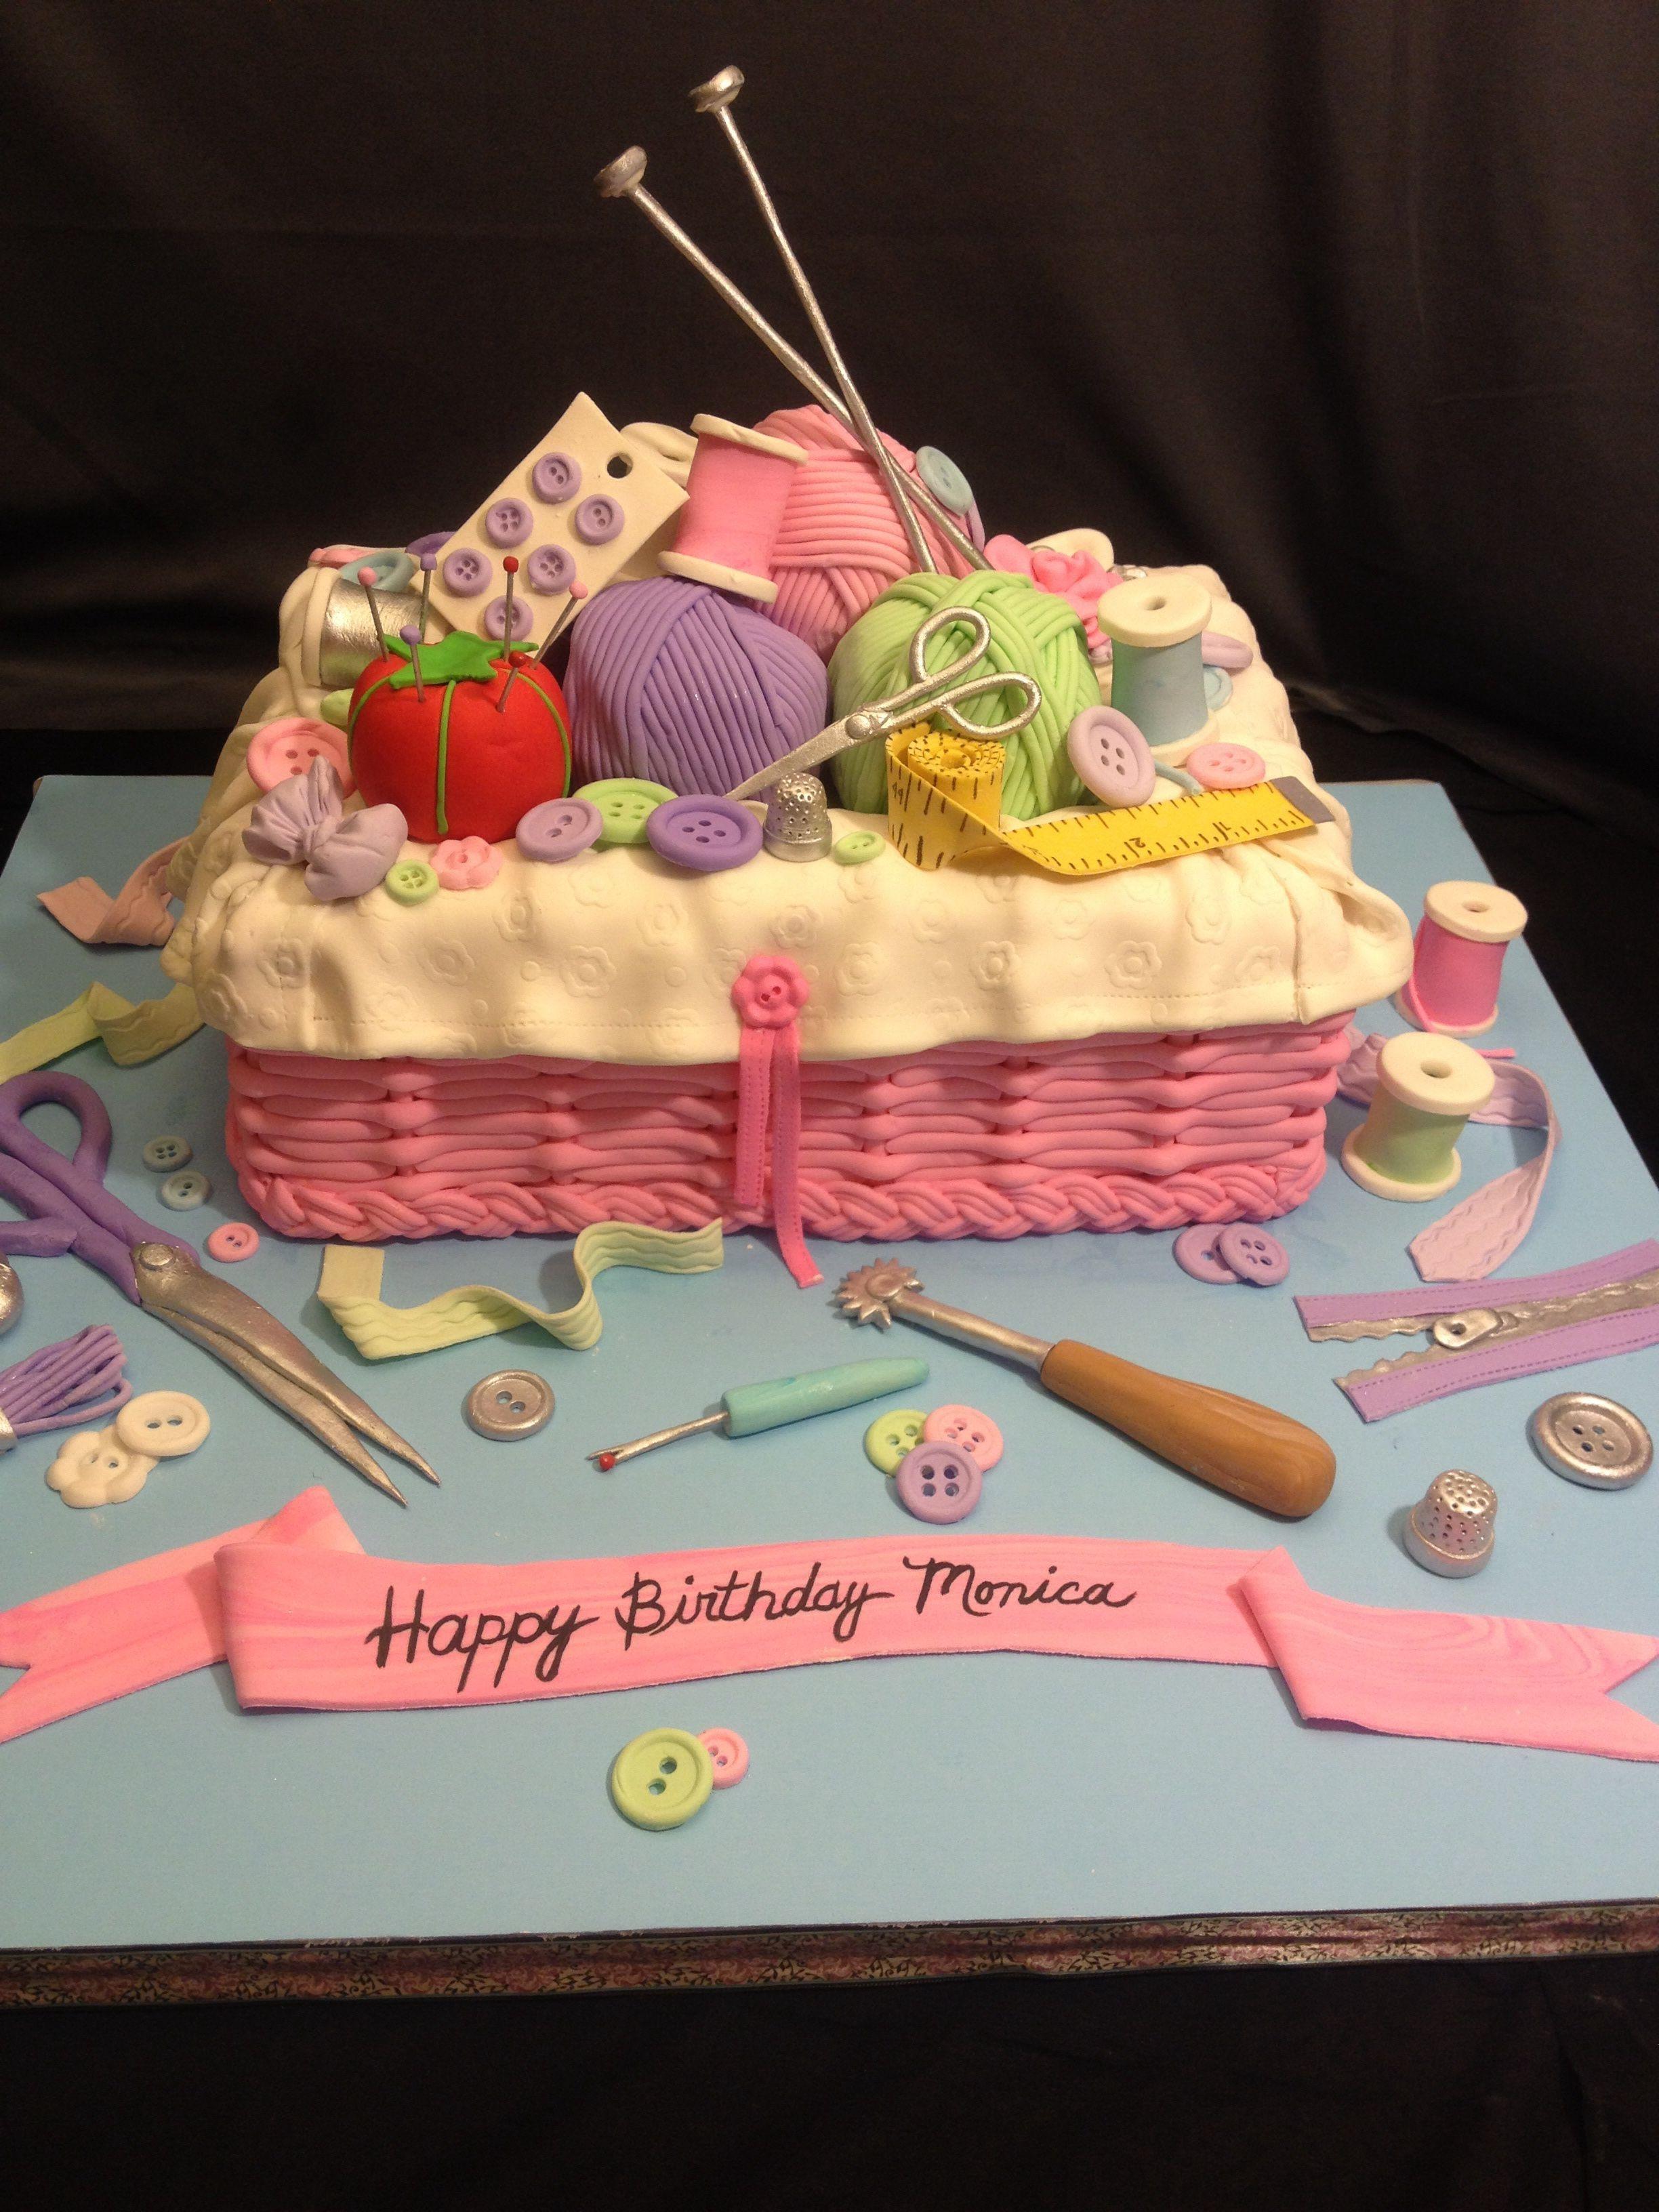 Sewing sewing cake knit knitting cake mothers day cake mom cake